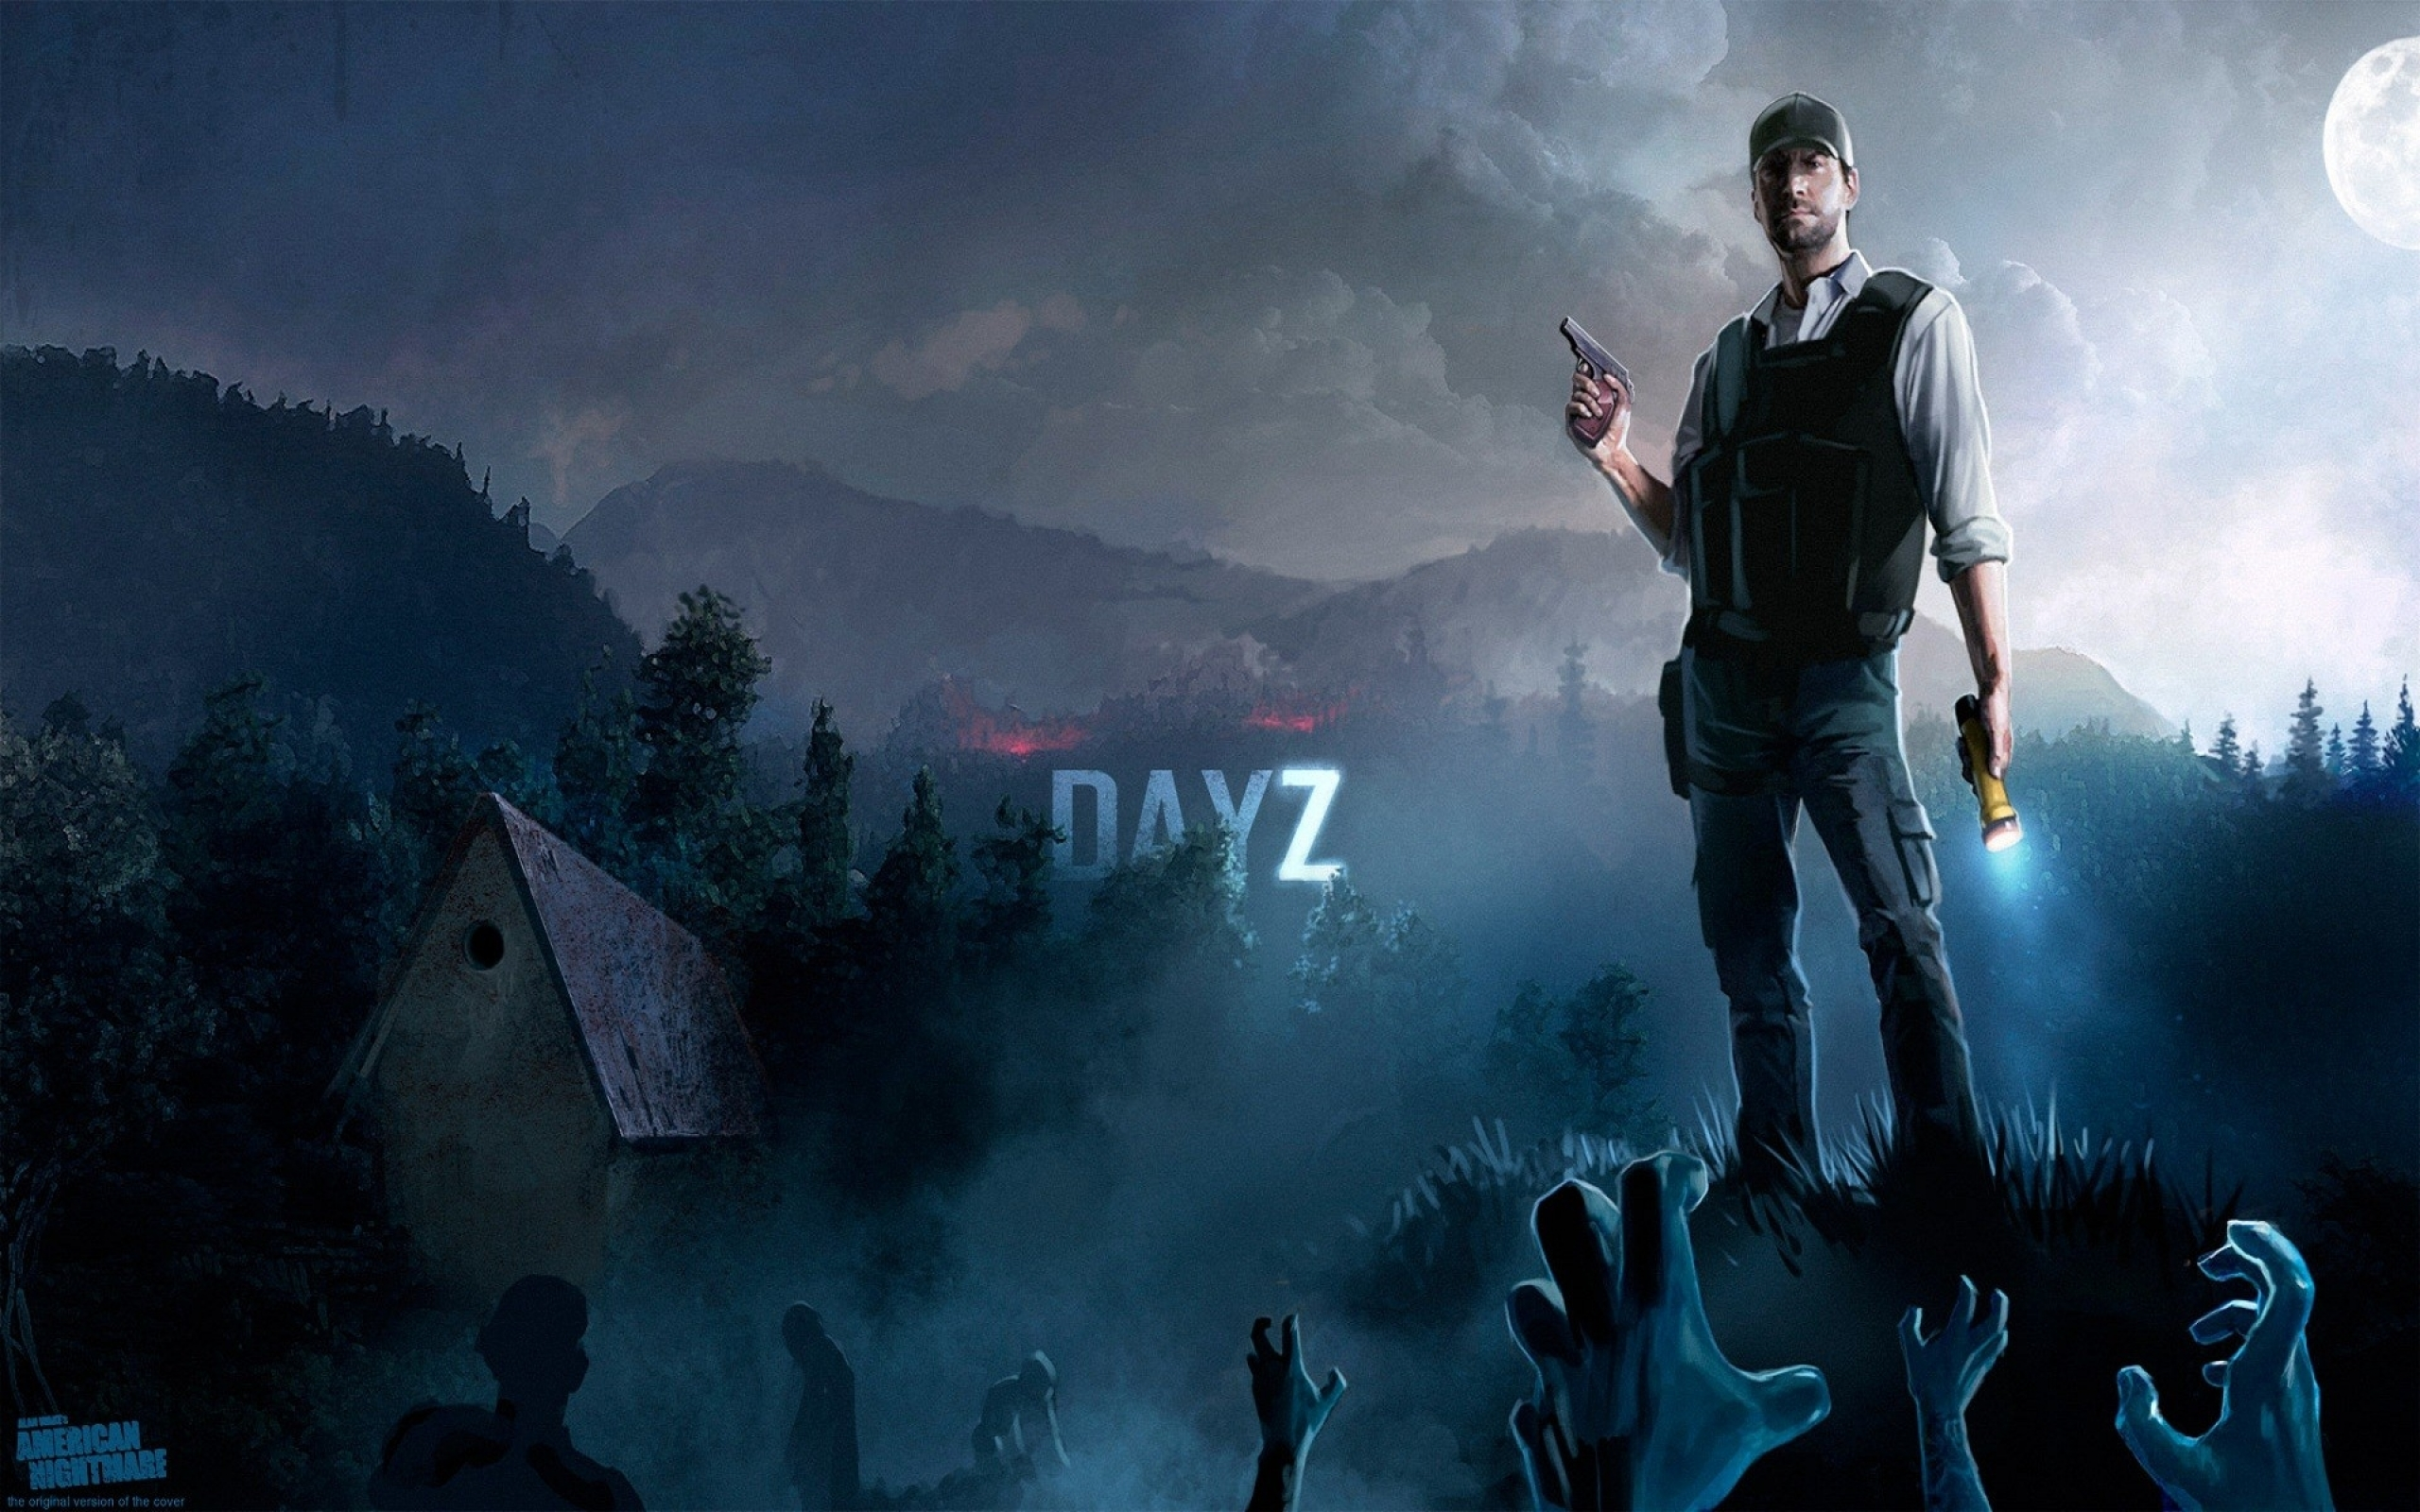 night men zombie apocalypse dayz 1920x1200 wallpaper Art HD Wallpaper 2560x1600